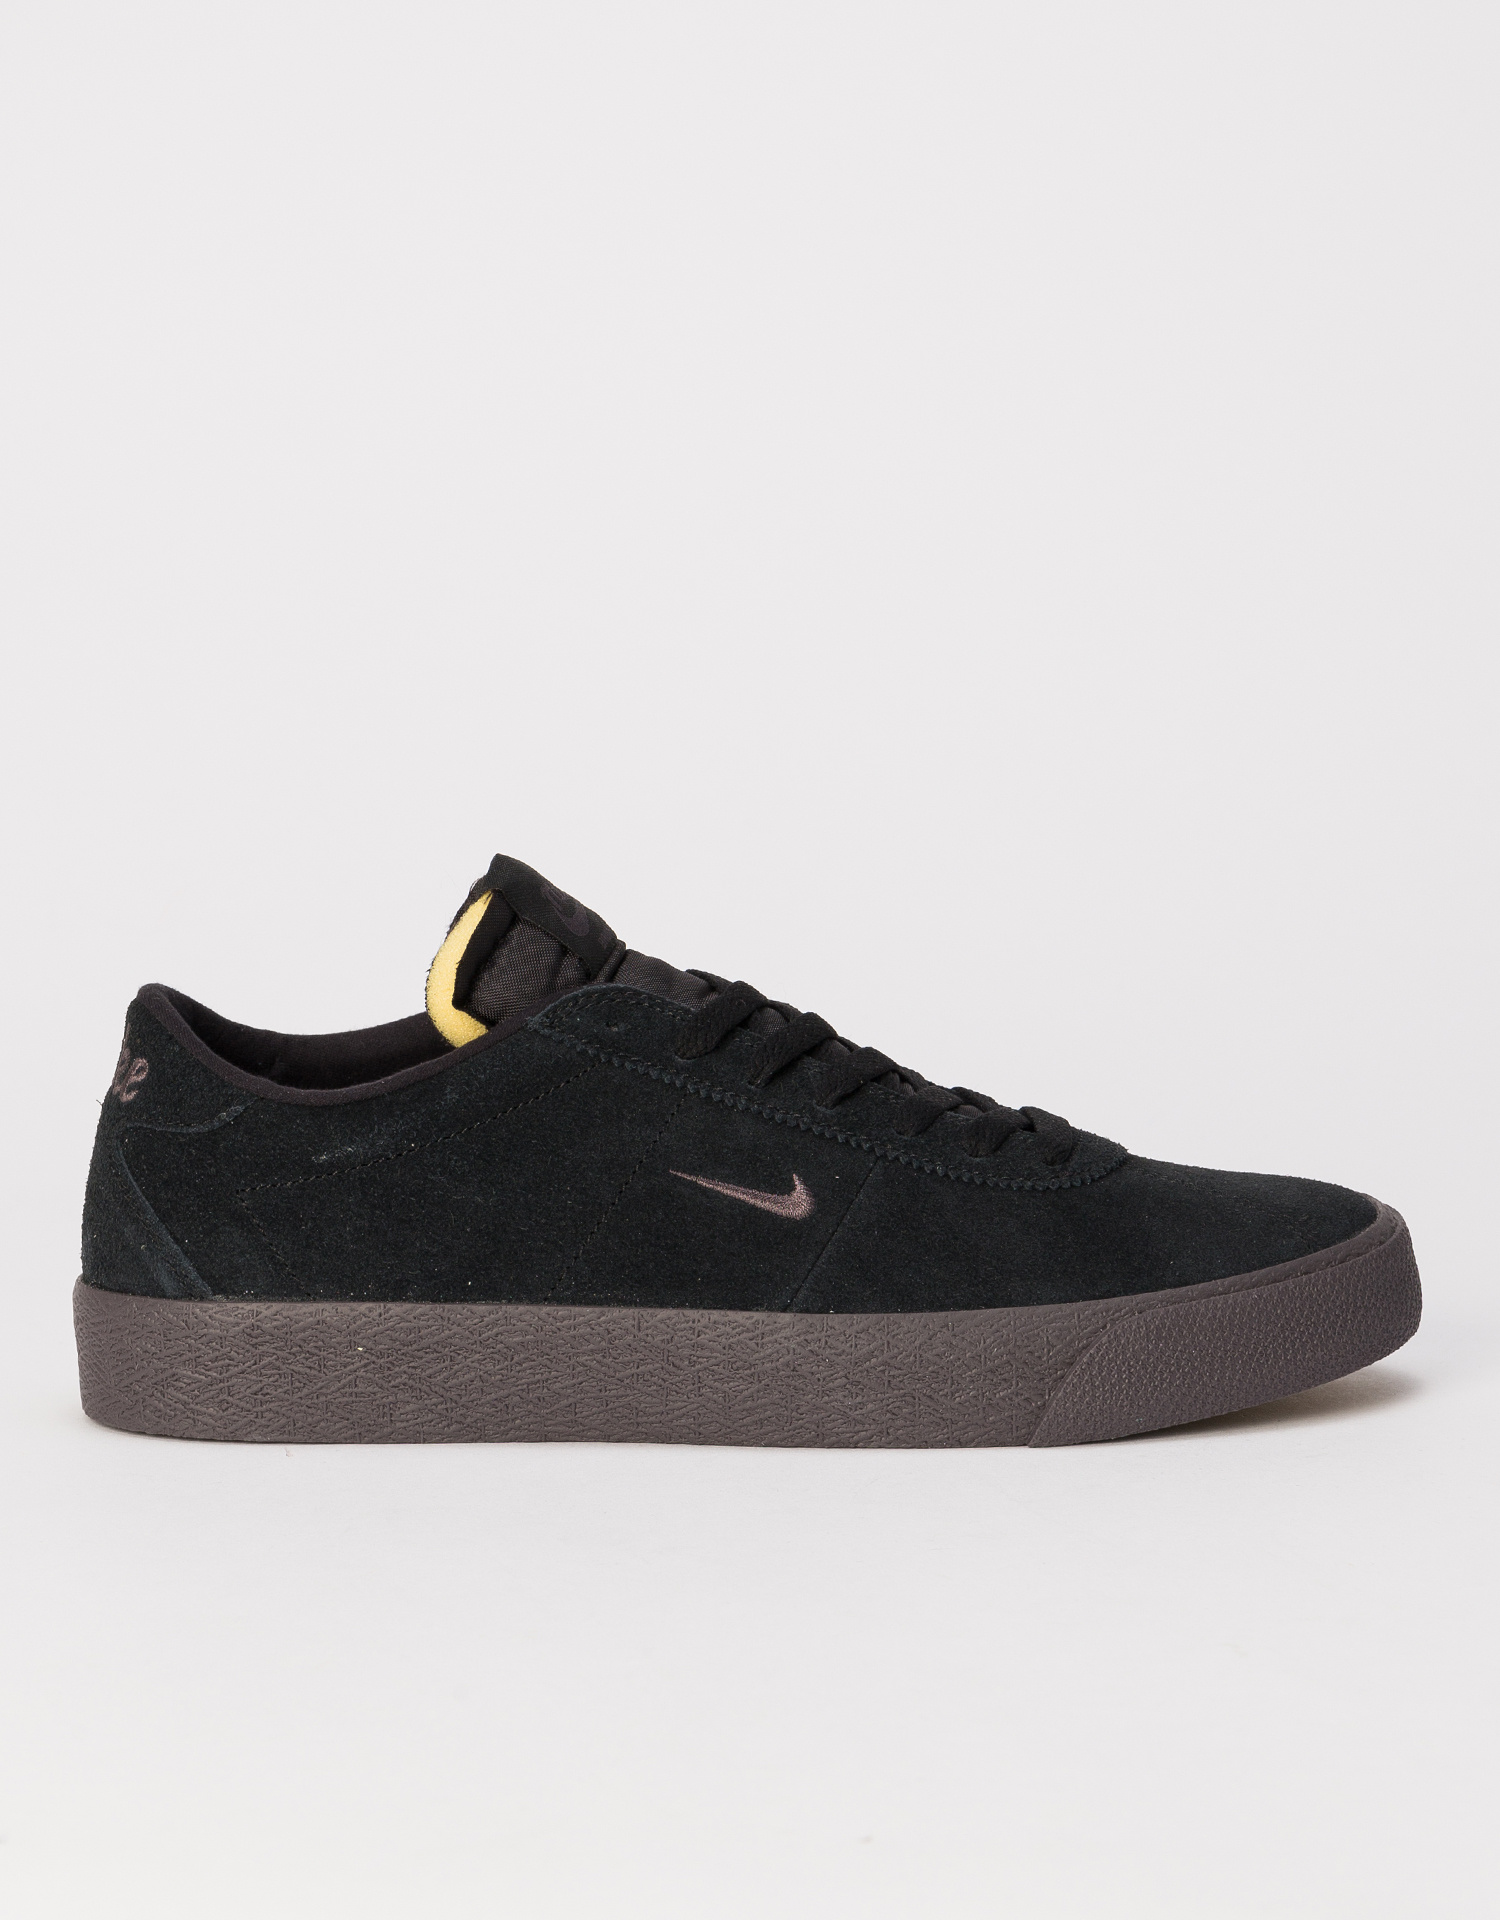 Nike SB Zoom Bruin black/thunder grey